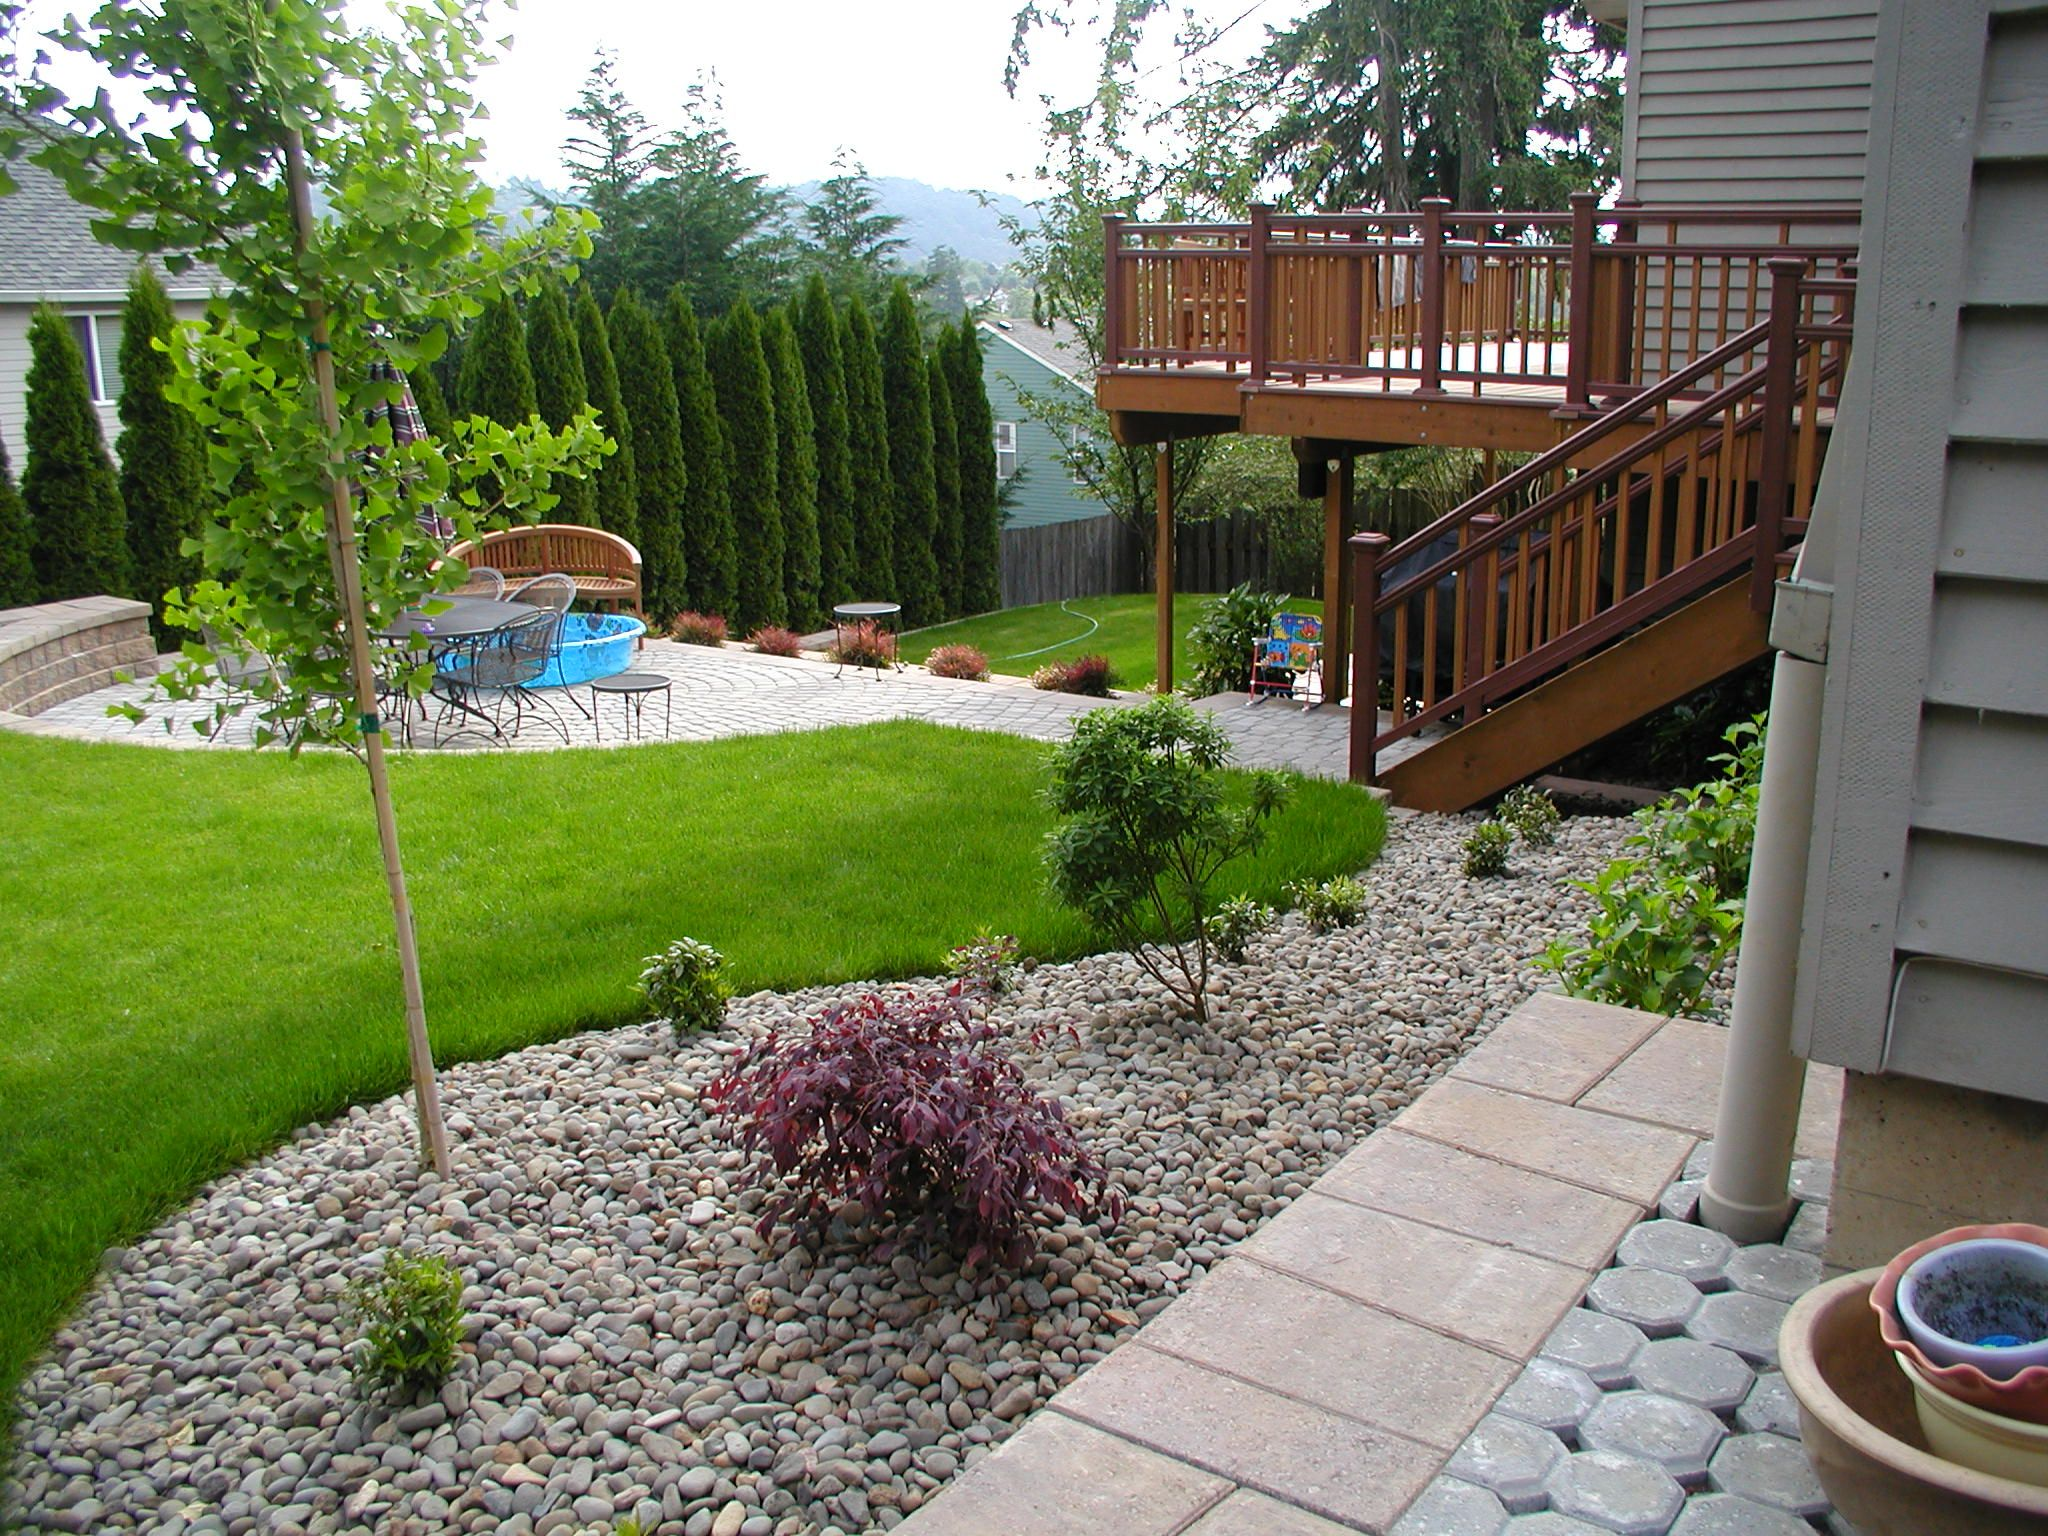 18 Simple Back Garden Ideas Inspiration Imageries Small Backyard